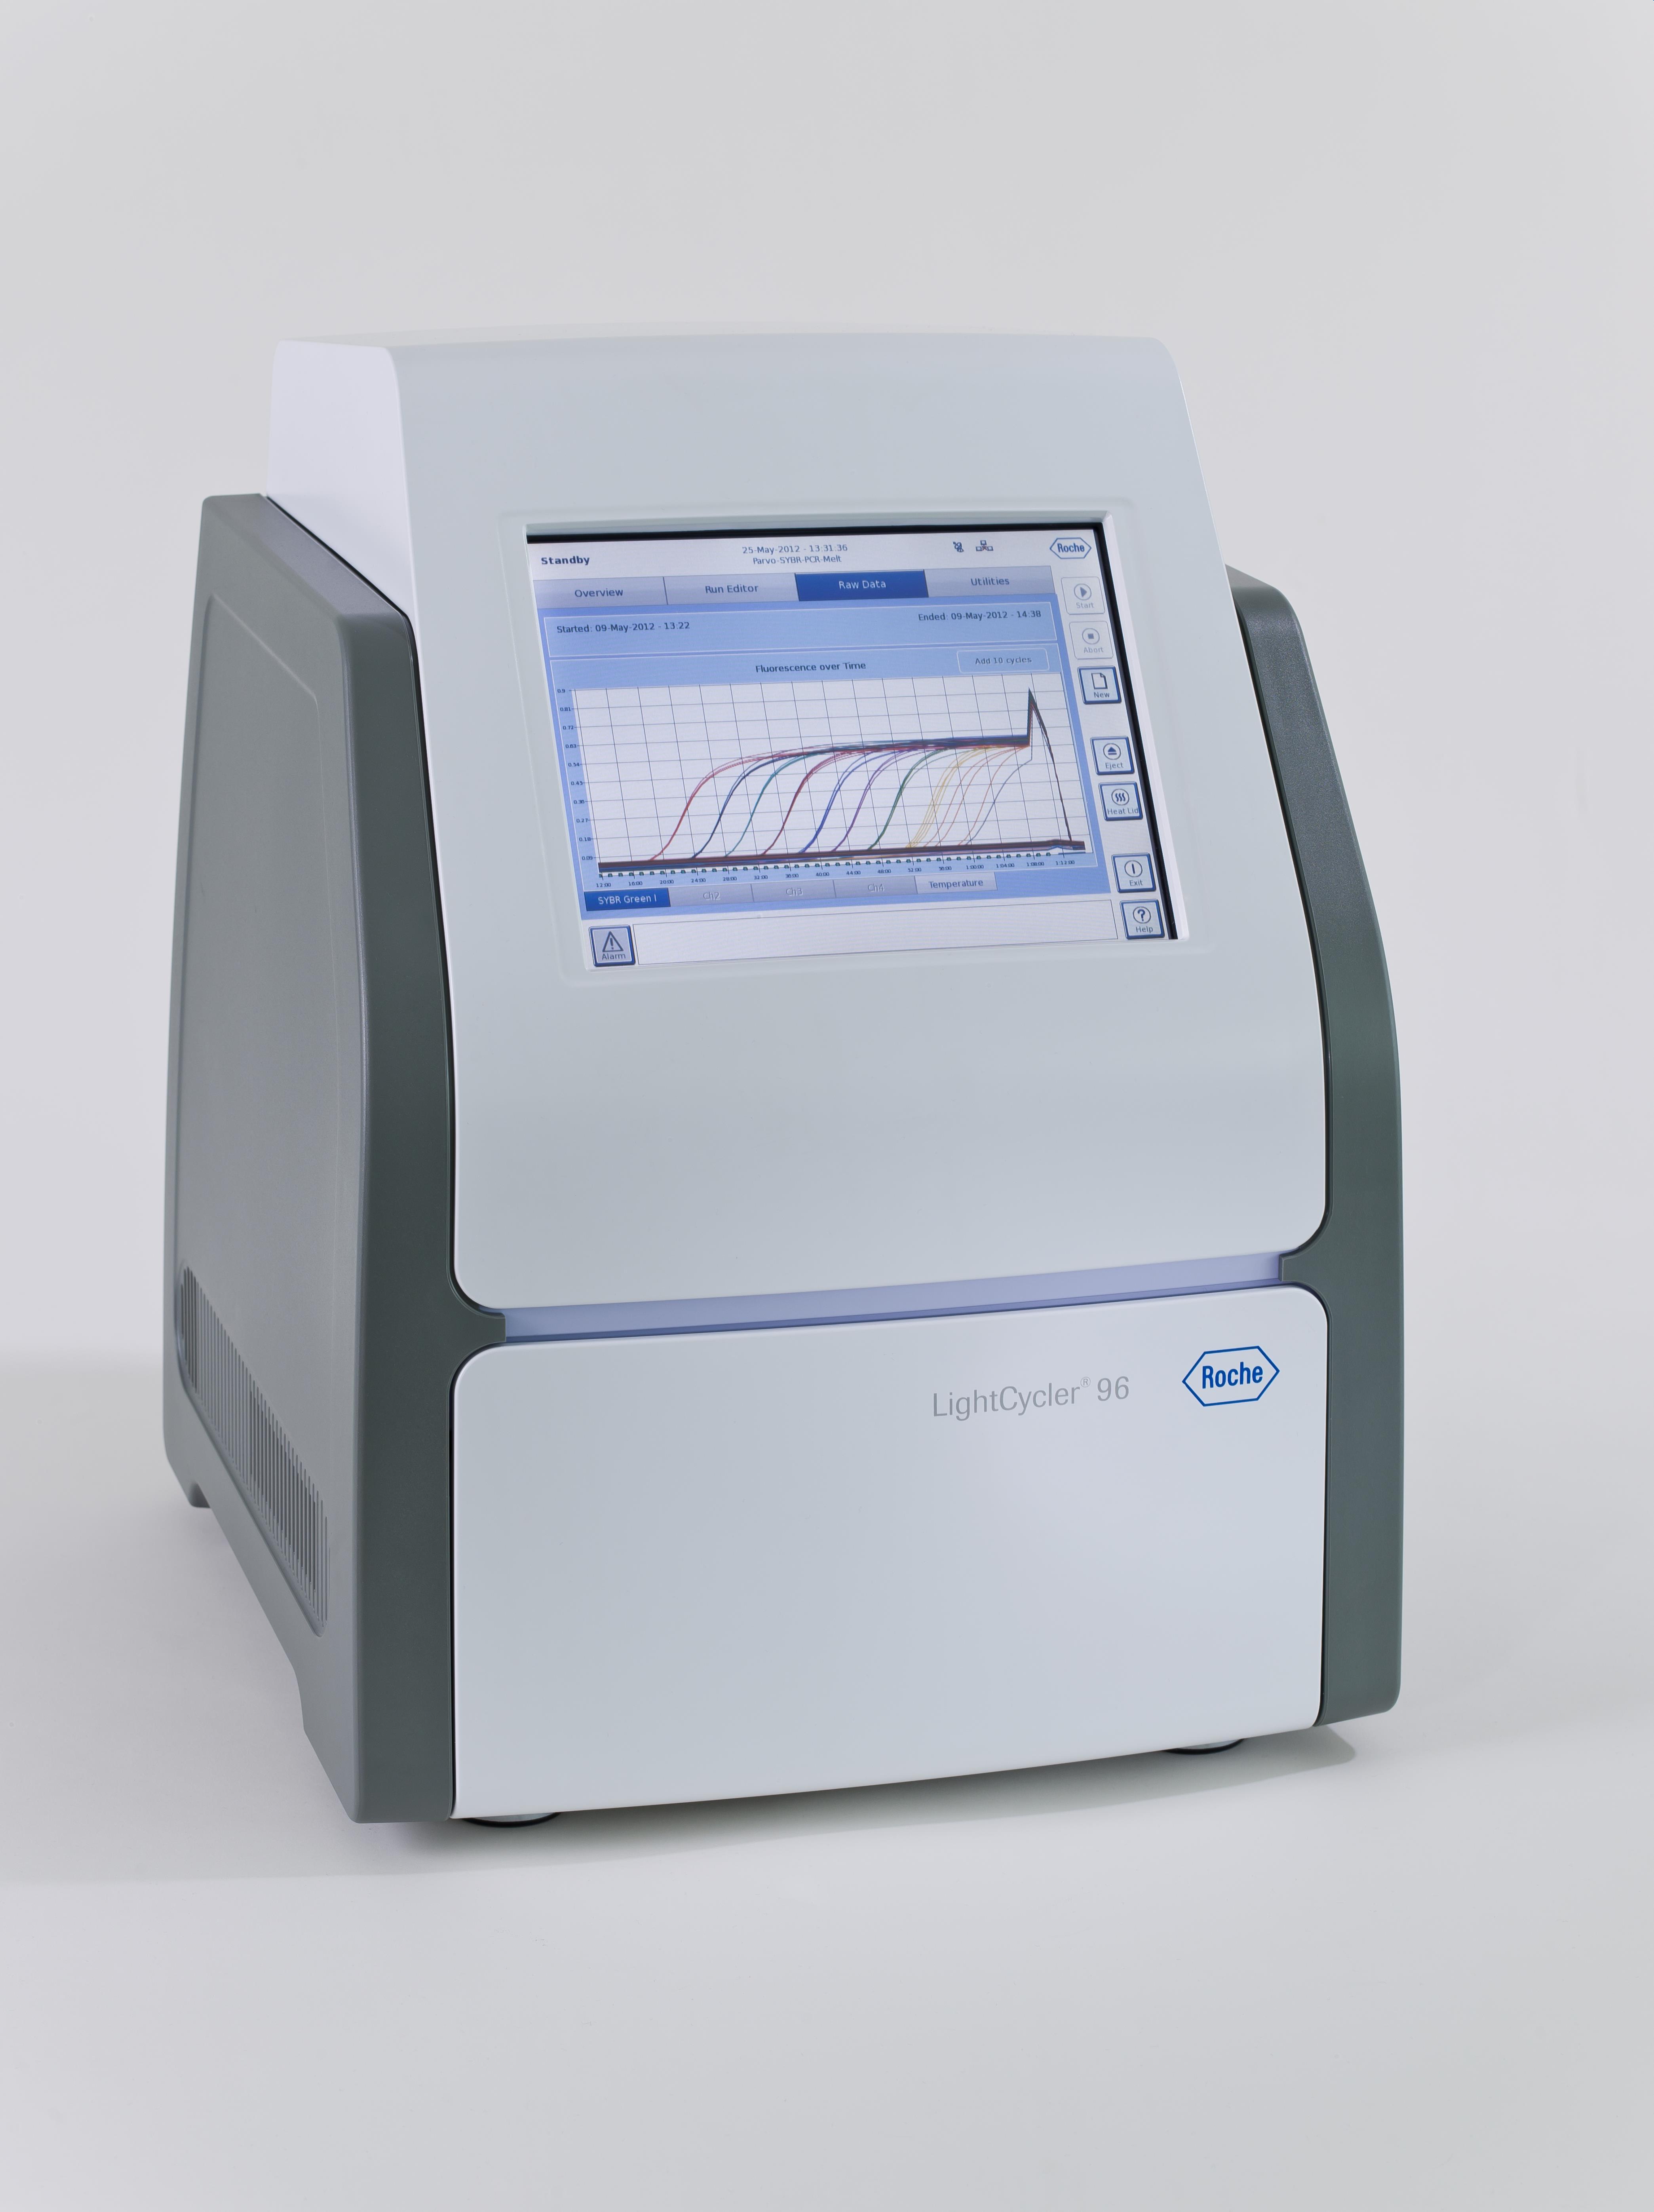 LightCycler® 96 全自动荧光定量PCR仪